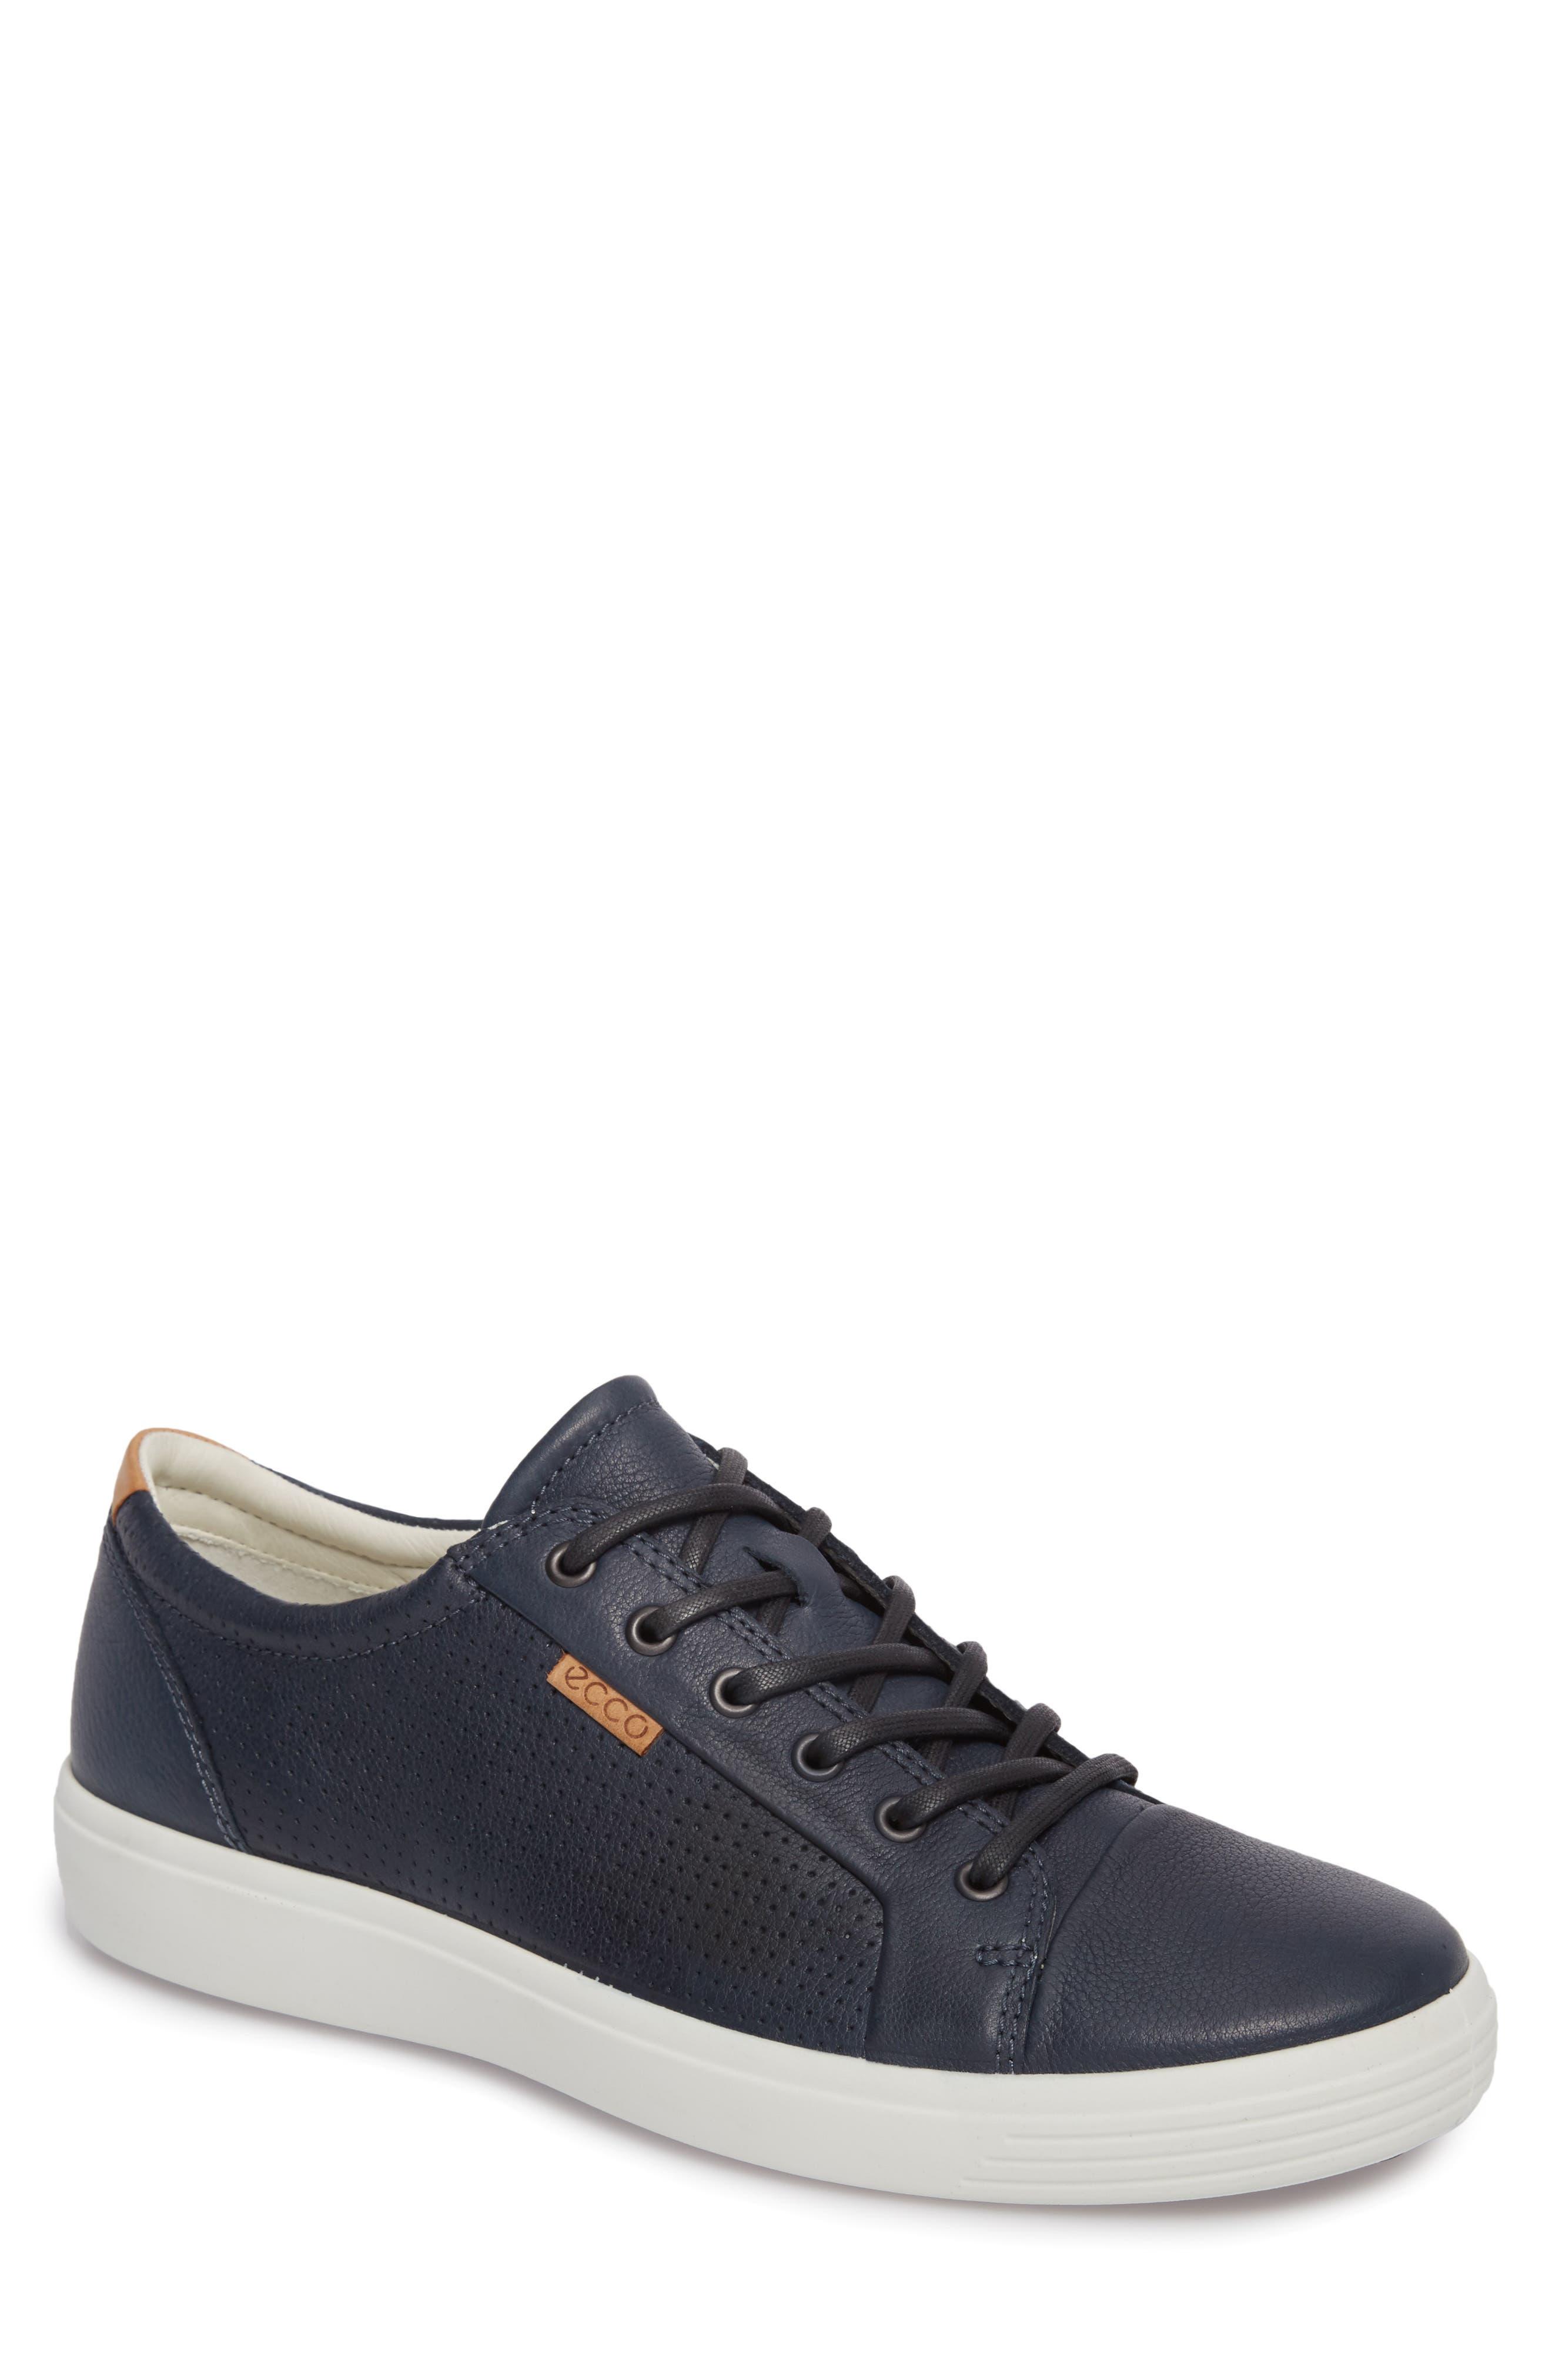 Main Image - ECCO 'Soft 7' Sneaker (Men)